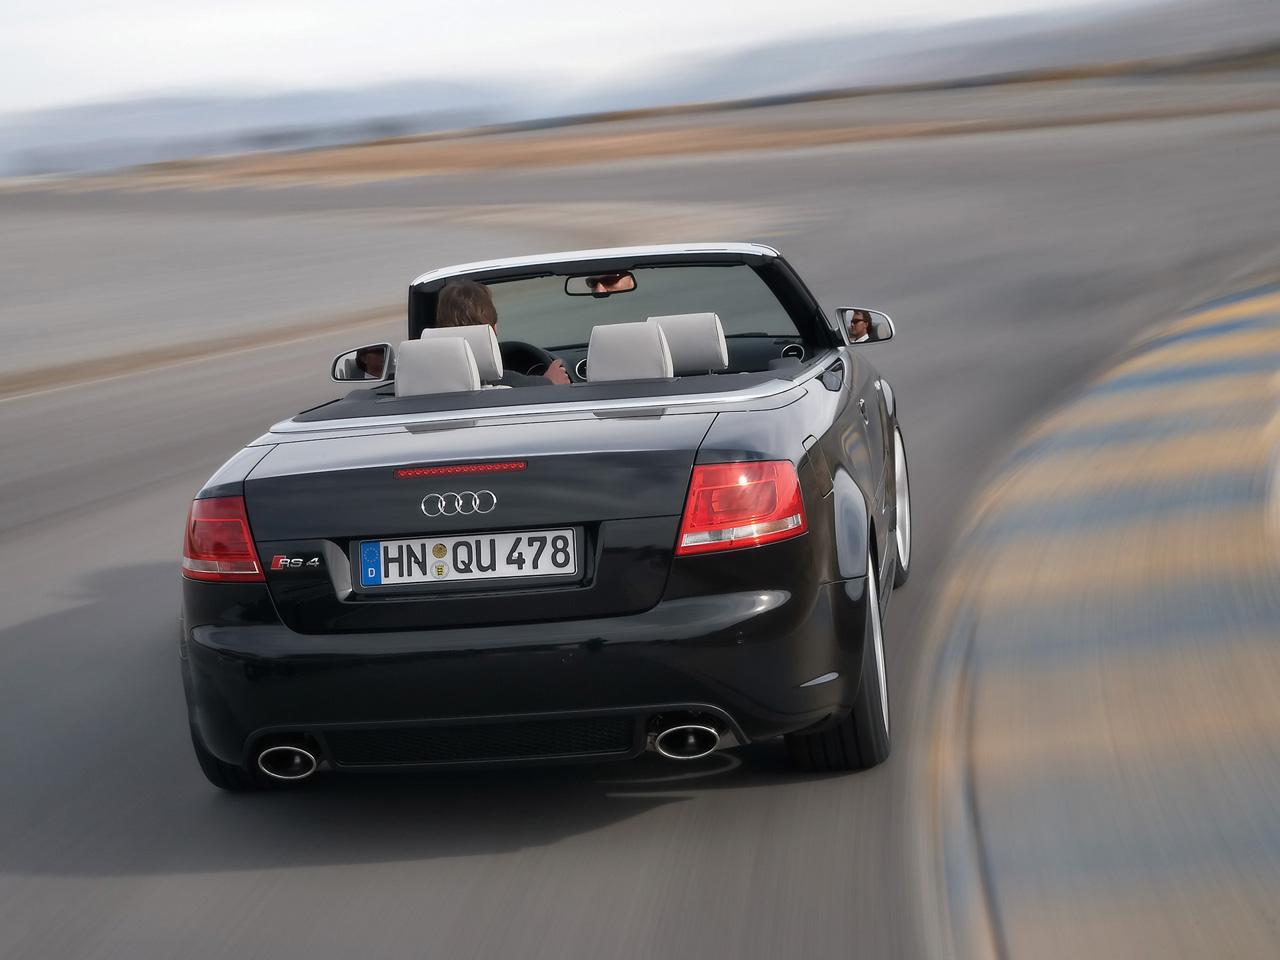 2007 Audi RS4 Image